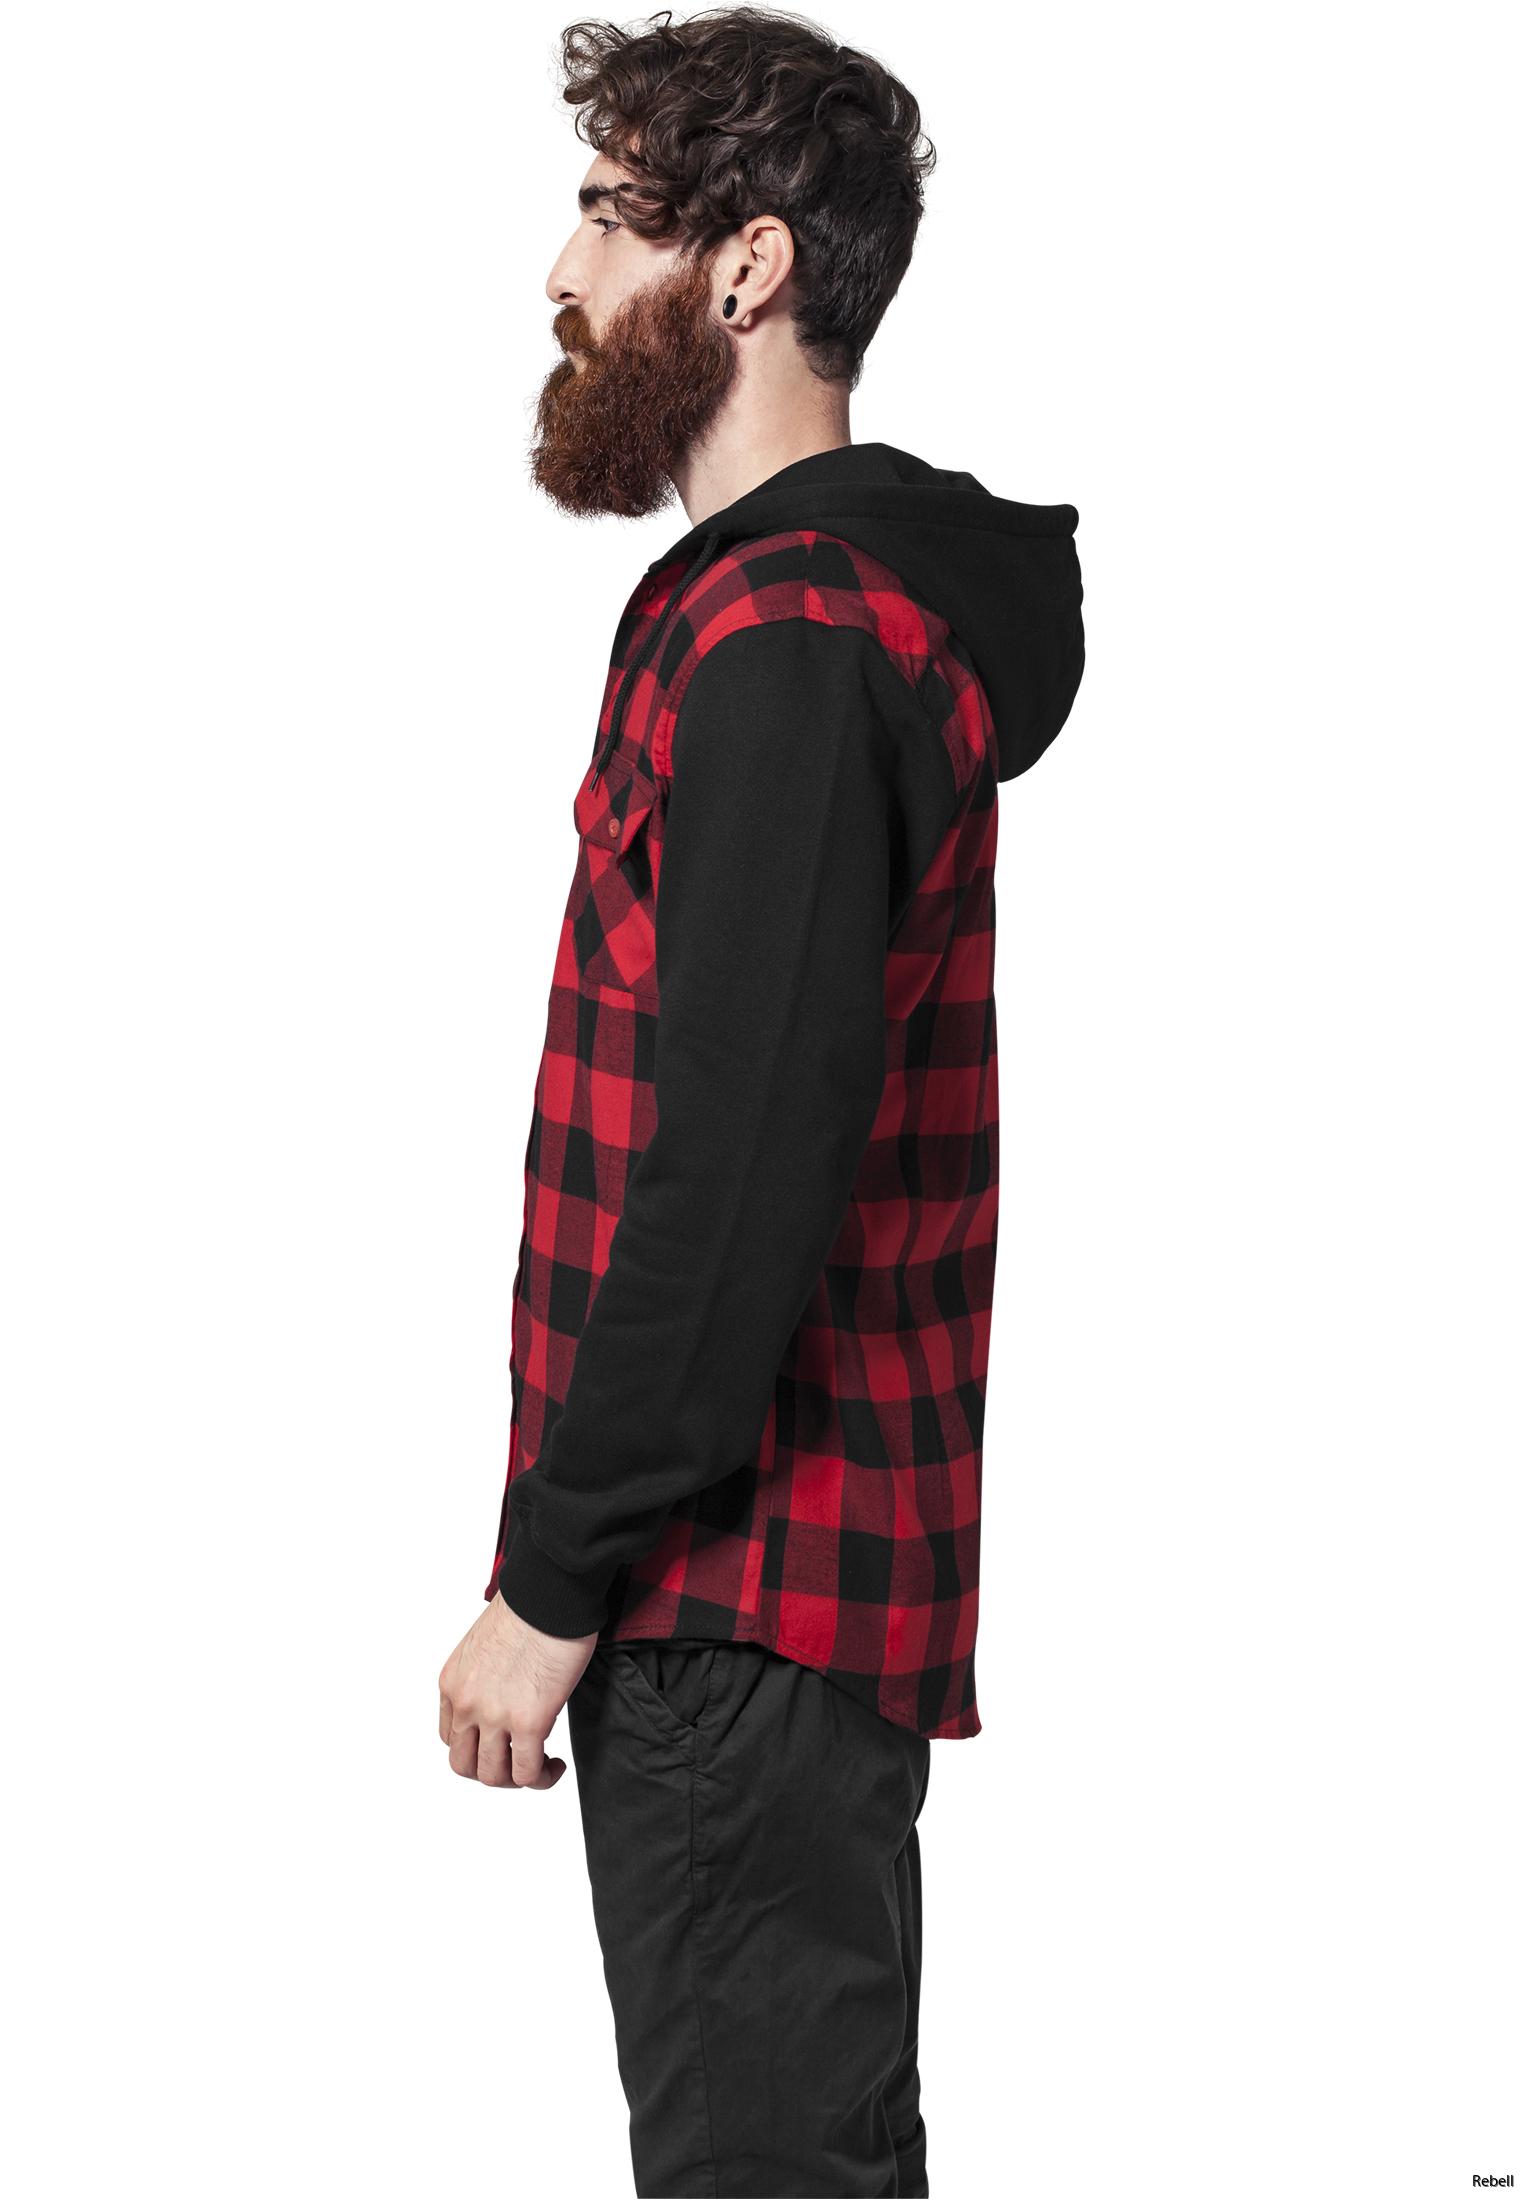 TB513_M4-00283black-red-black